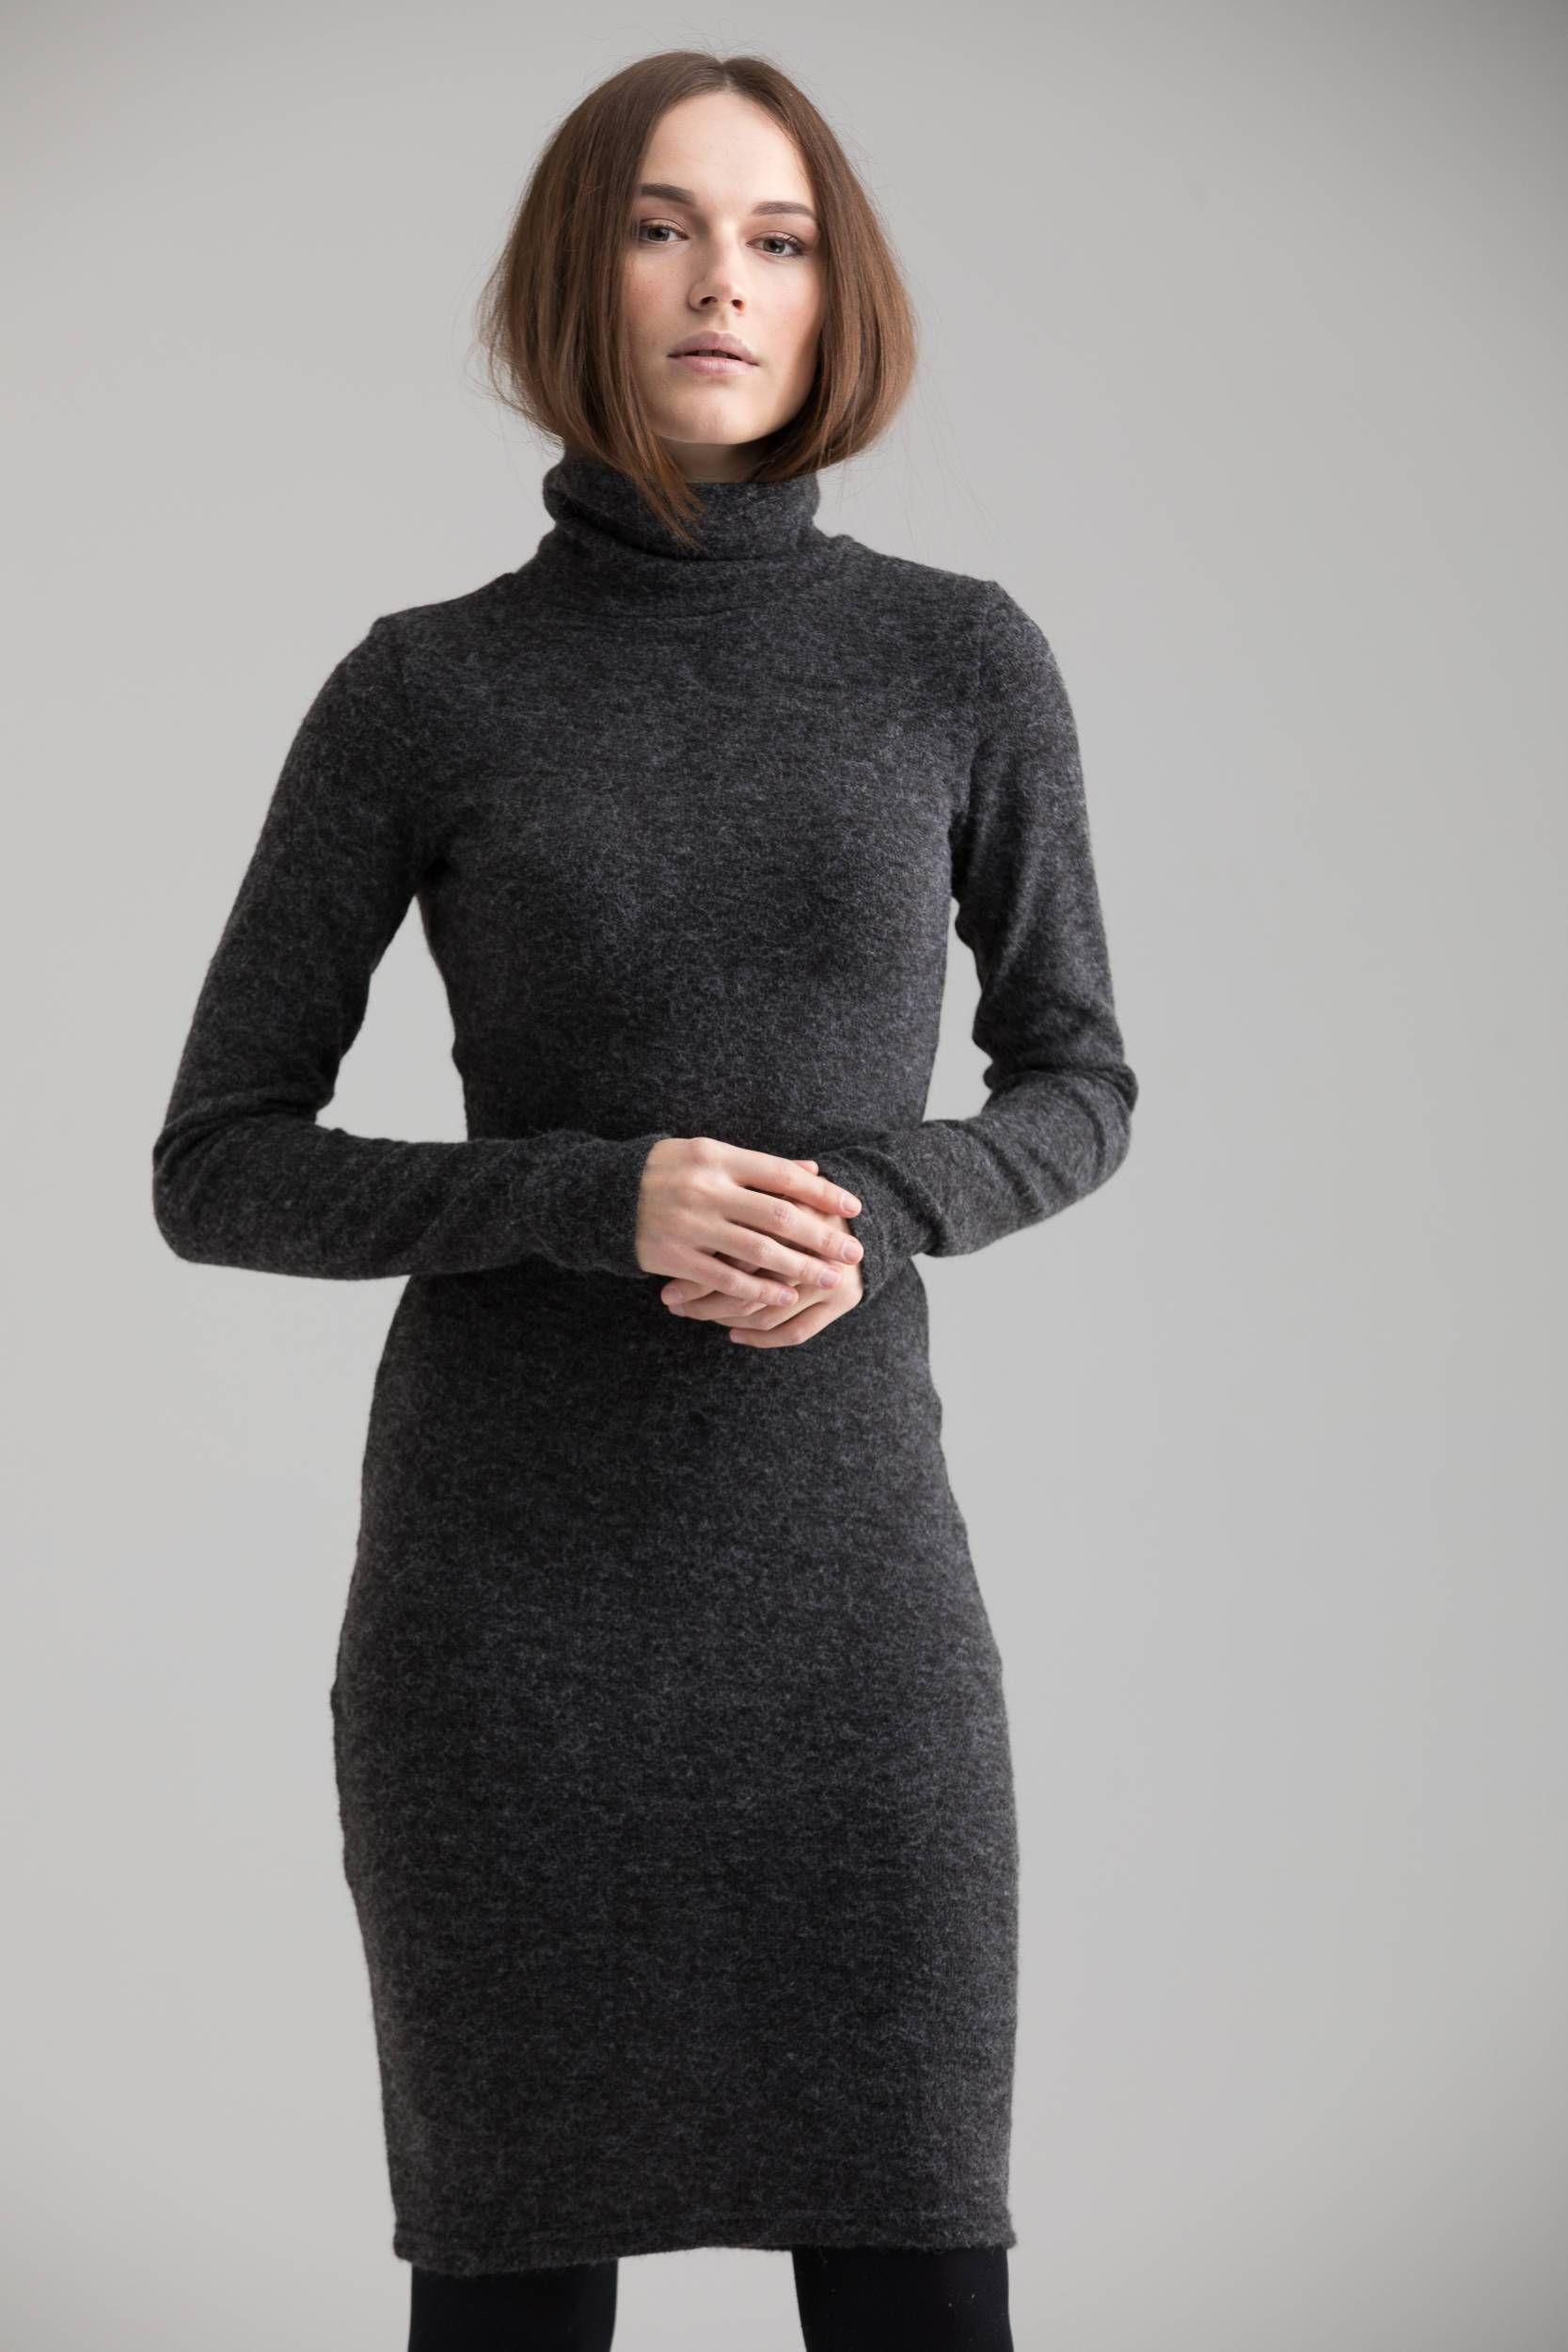 Grey turtleneck long sleeve winter dress casual dresses